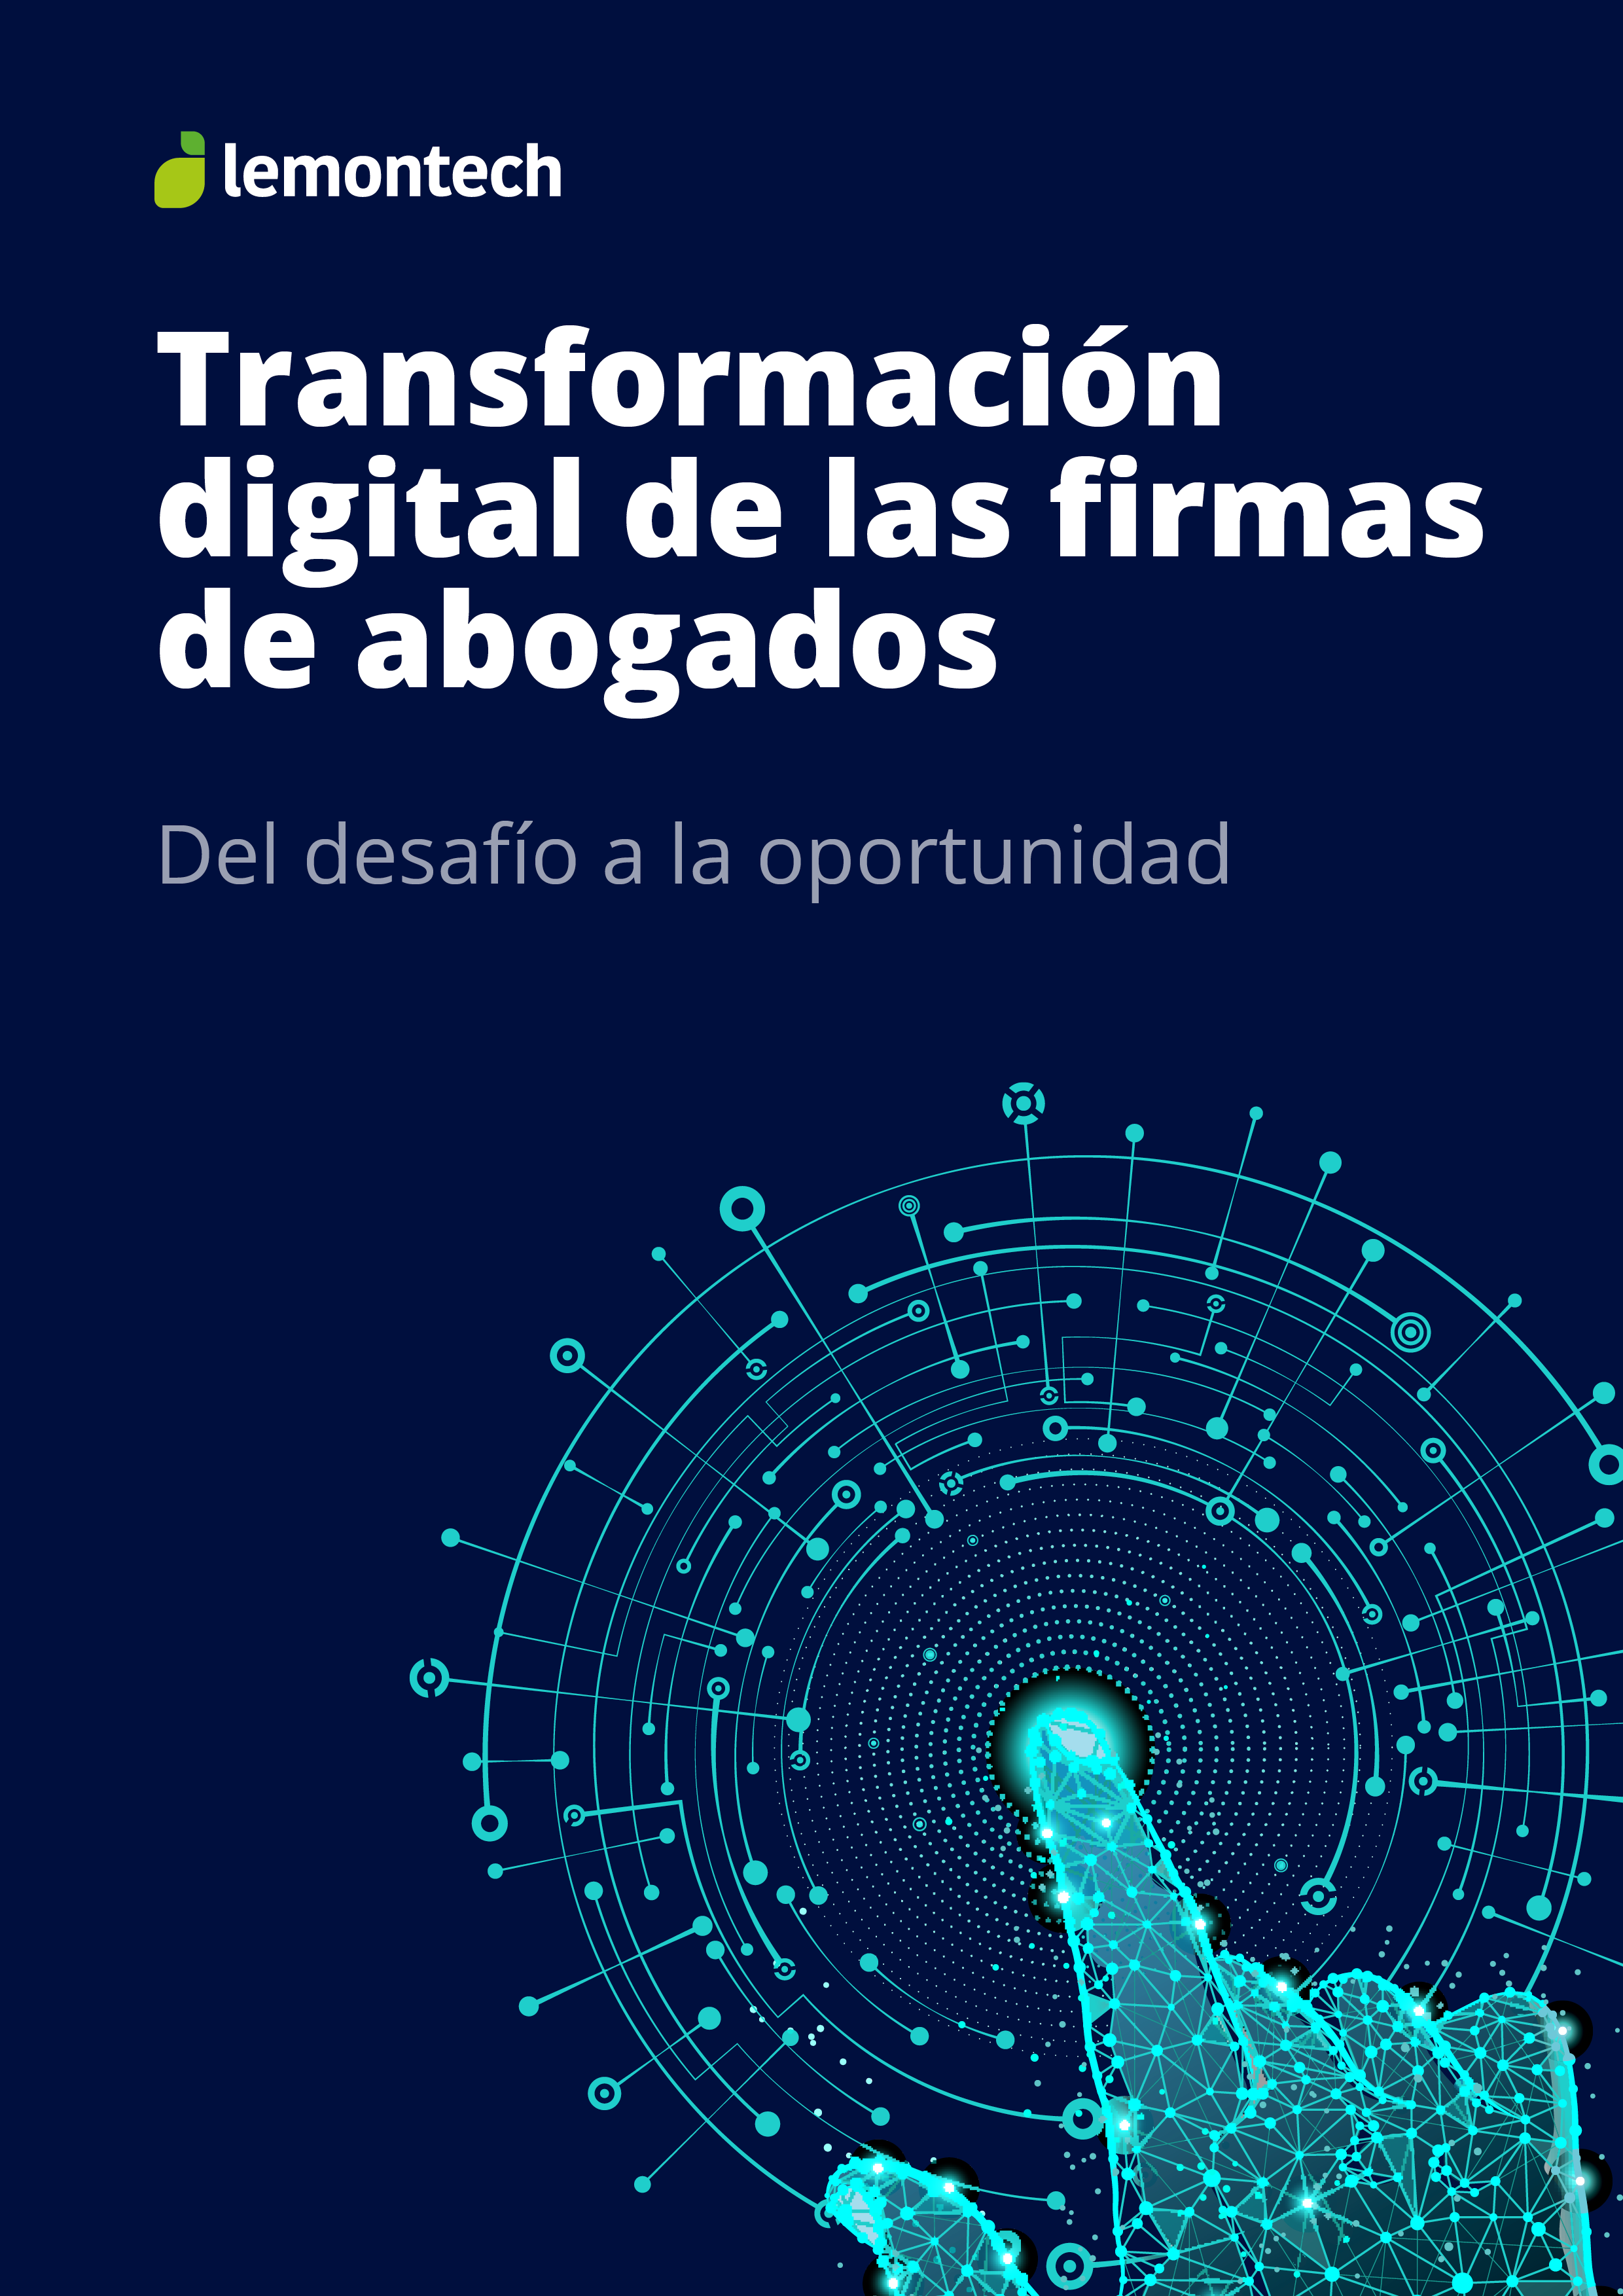 LMN - Transformación digital de las firmas de abogados - Portada 2D